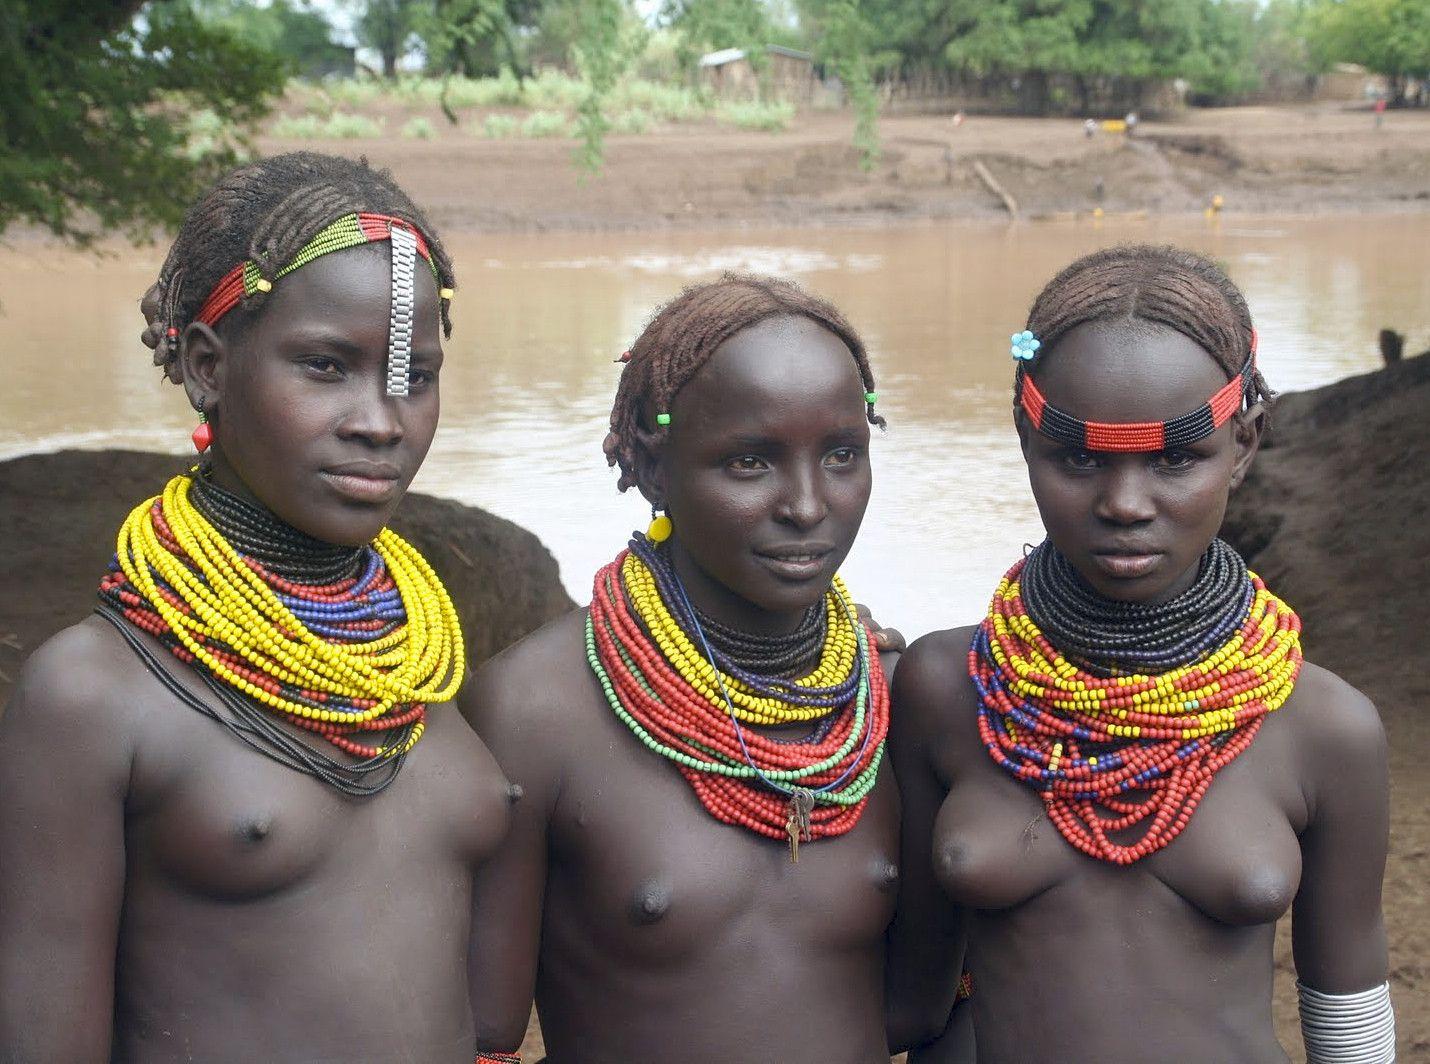 Секс туалете интим диких племен африки видео фото красивых